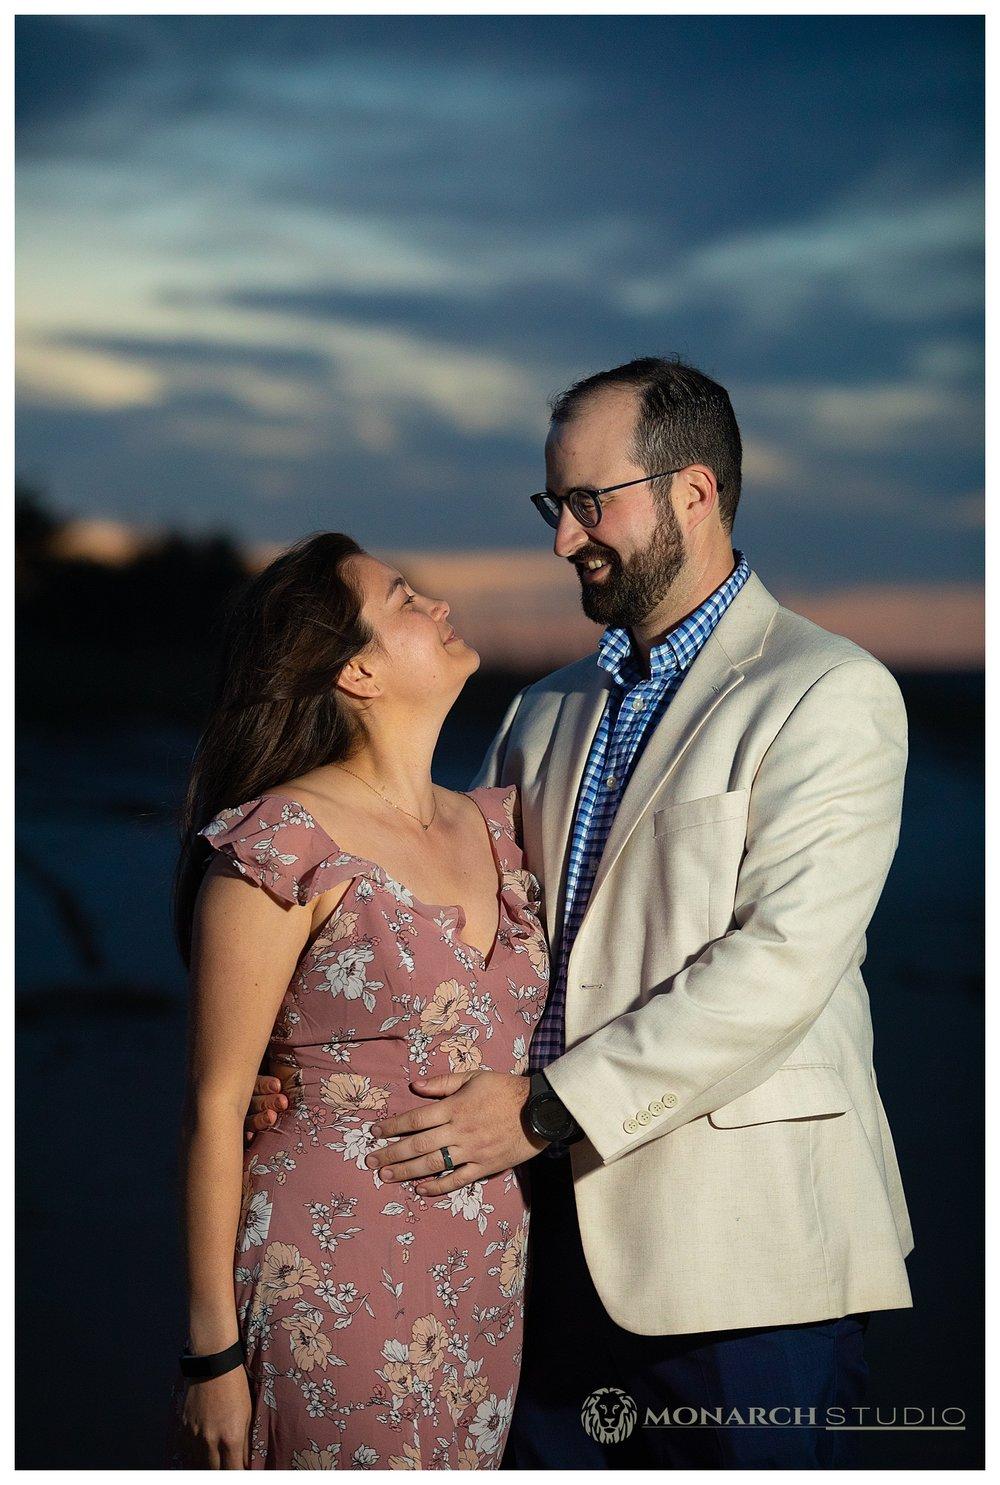 Amelia Island Surprise Proposal Photographer - 012.JPG